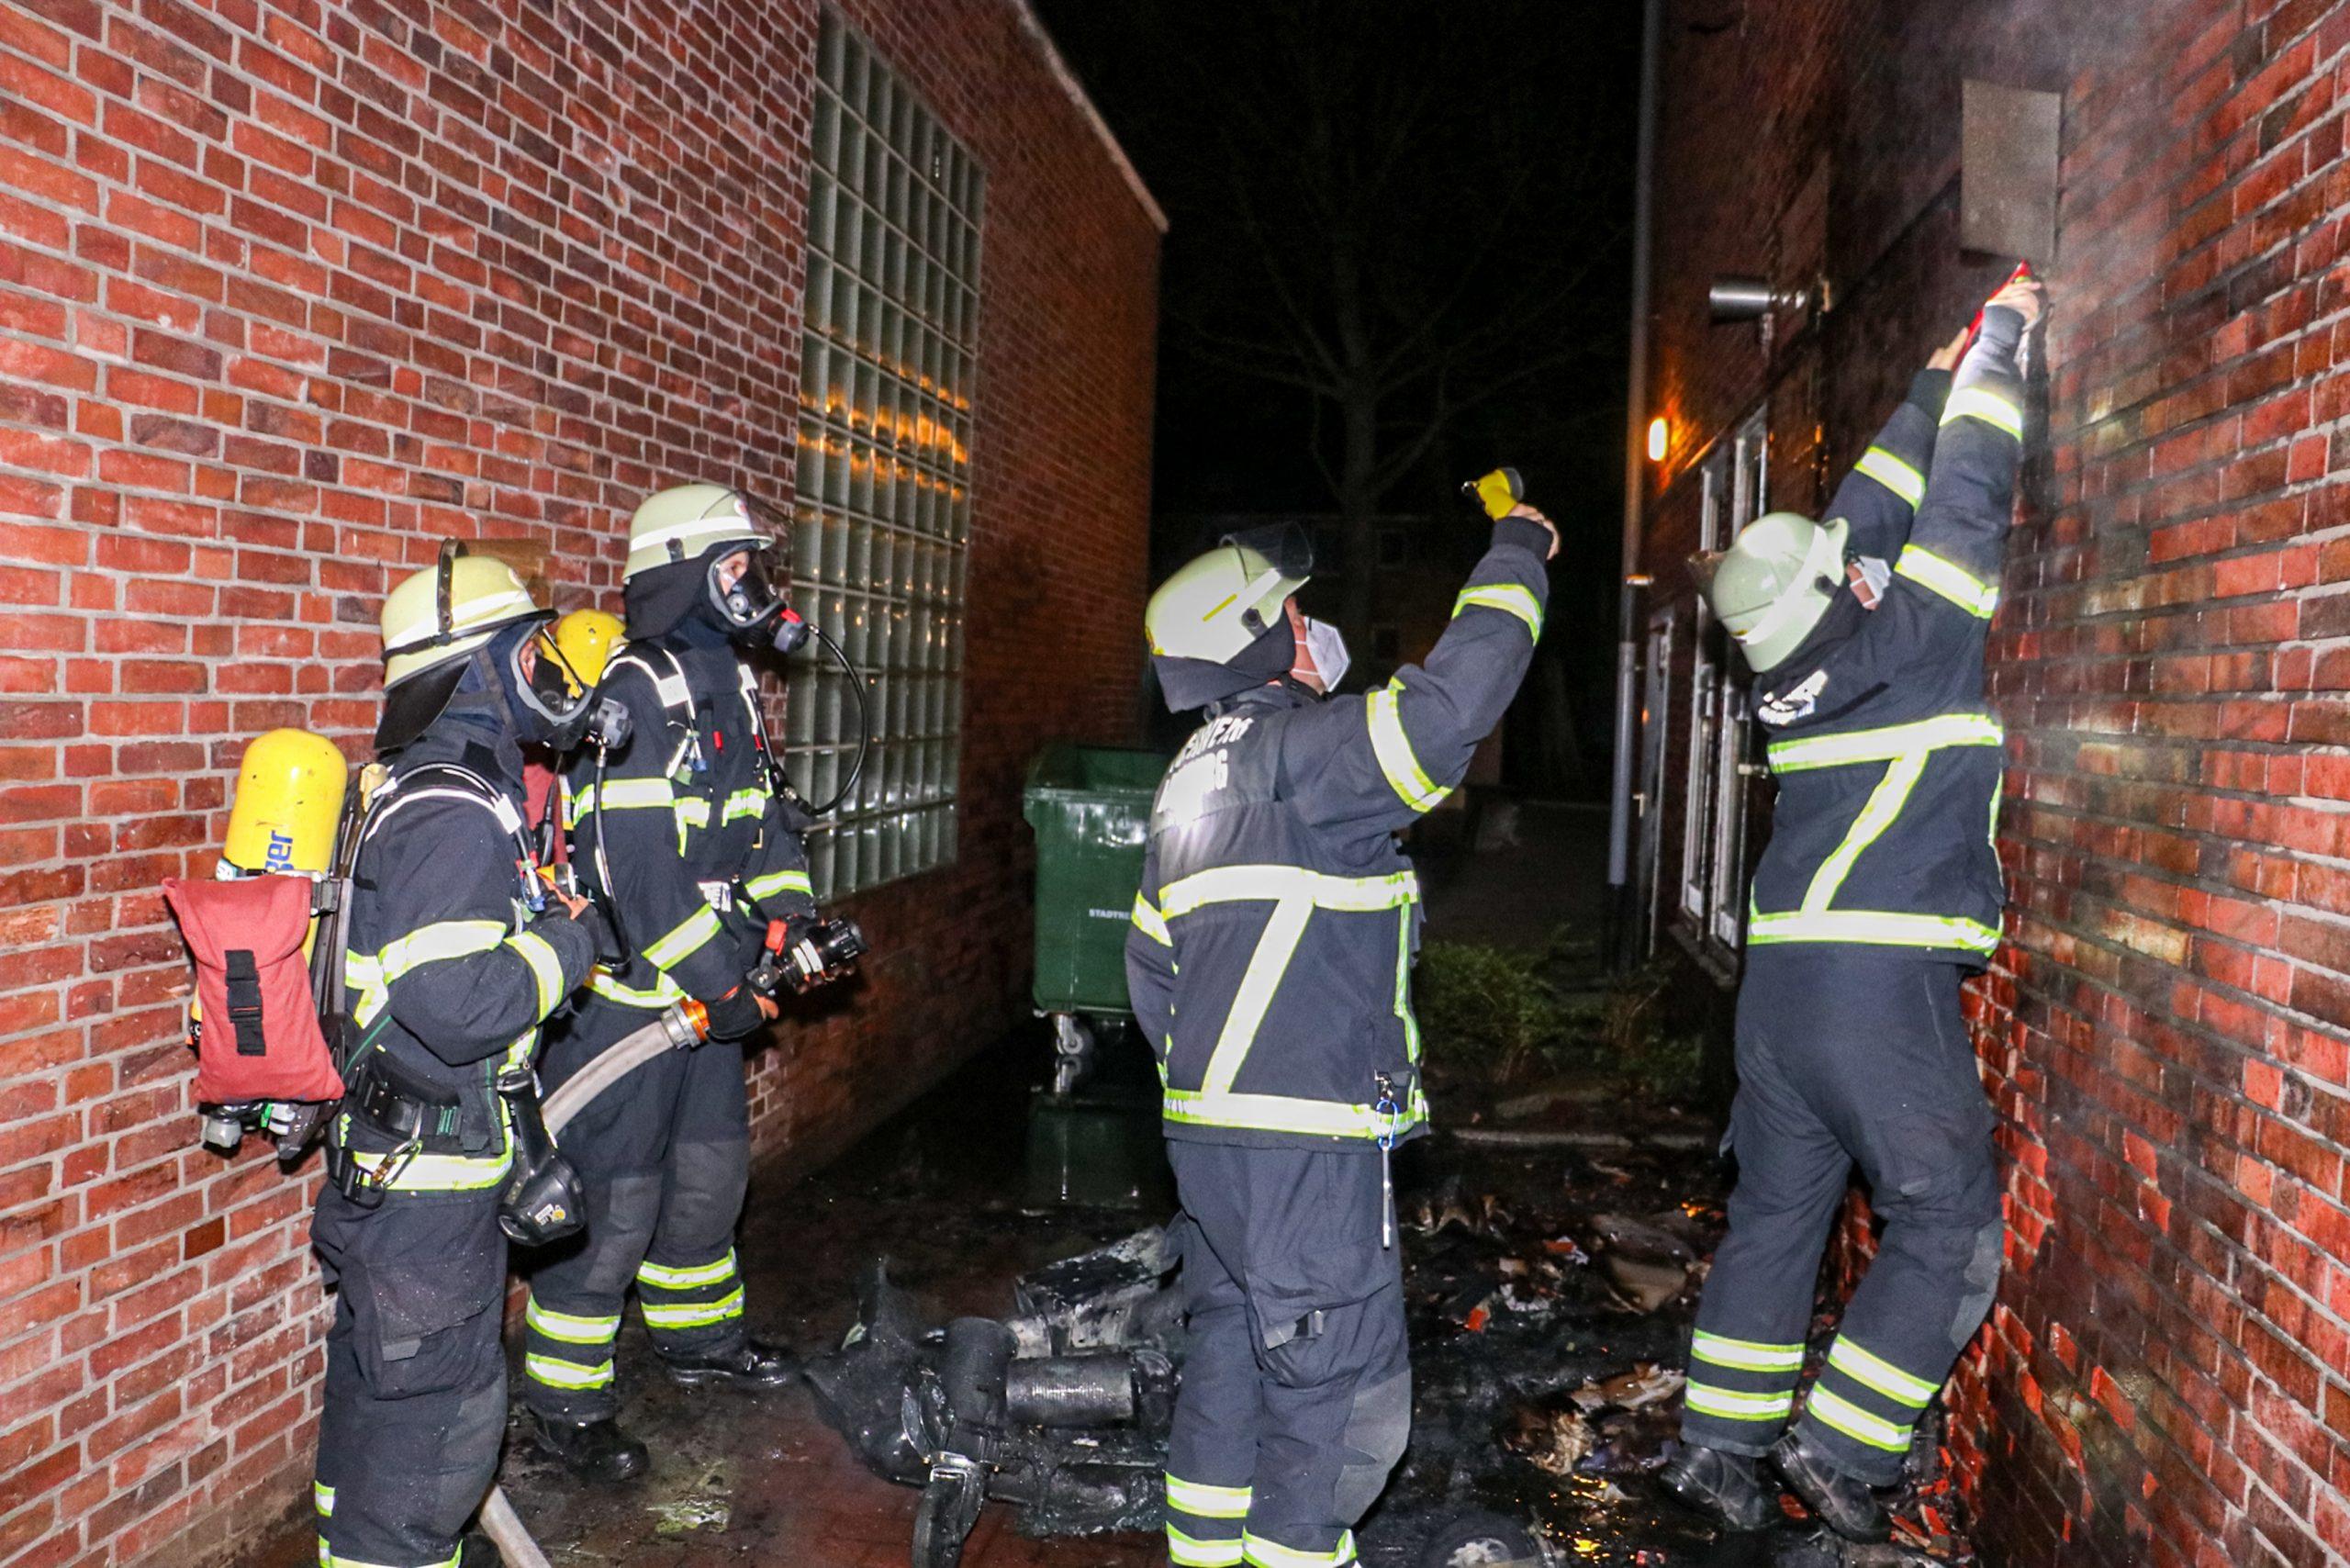 Feuer-in-Lokstedt-M-llcontainer-steht-an-Hauswand-in-Flammen-